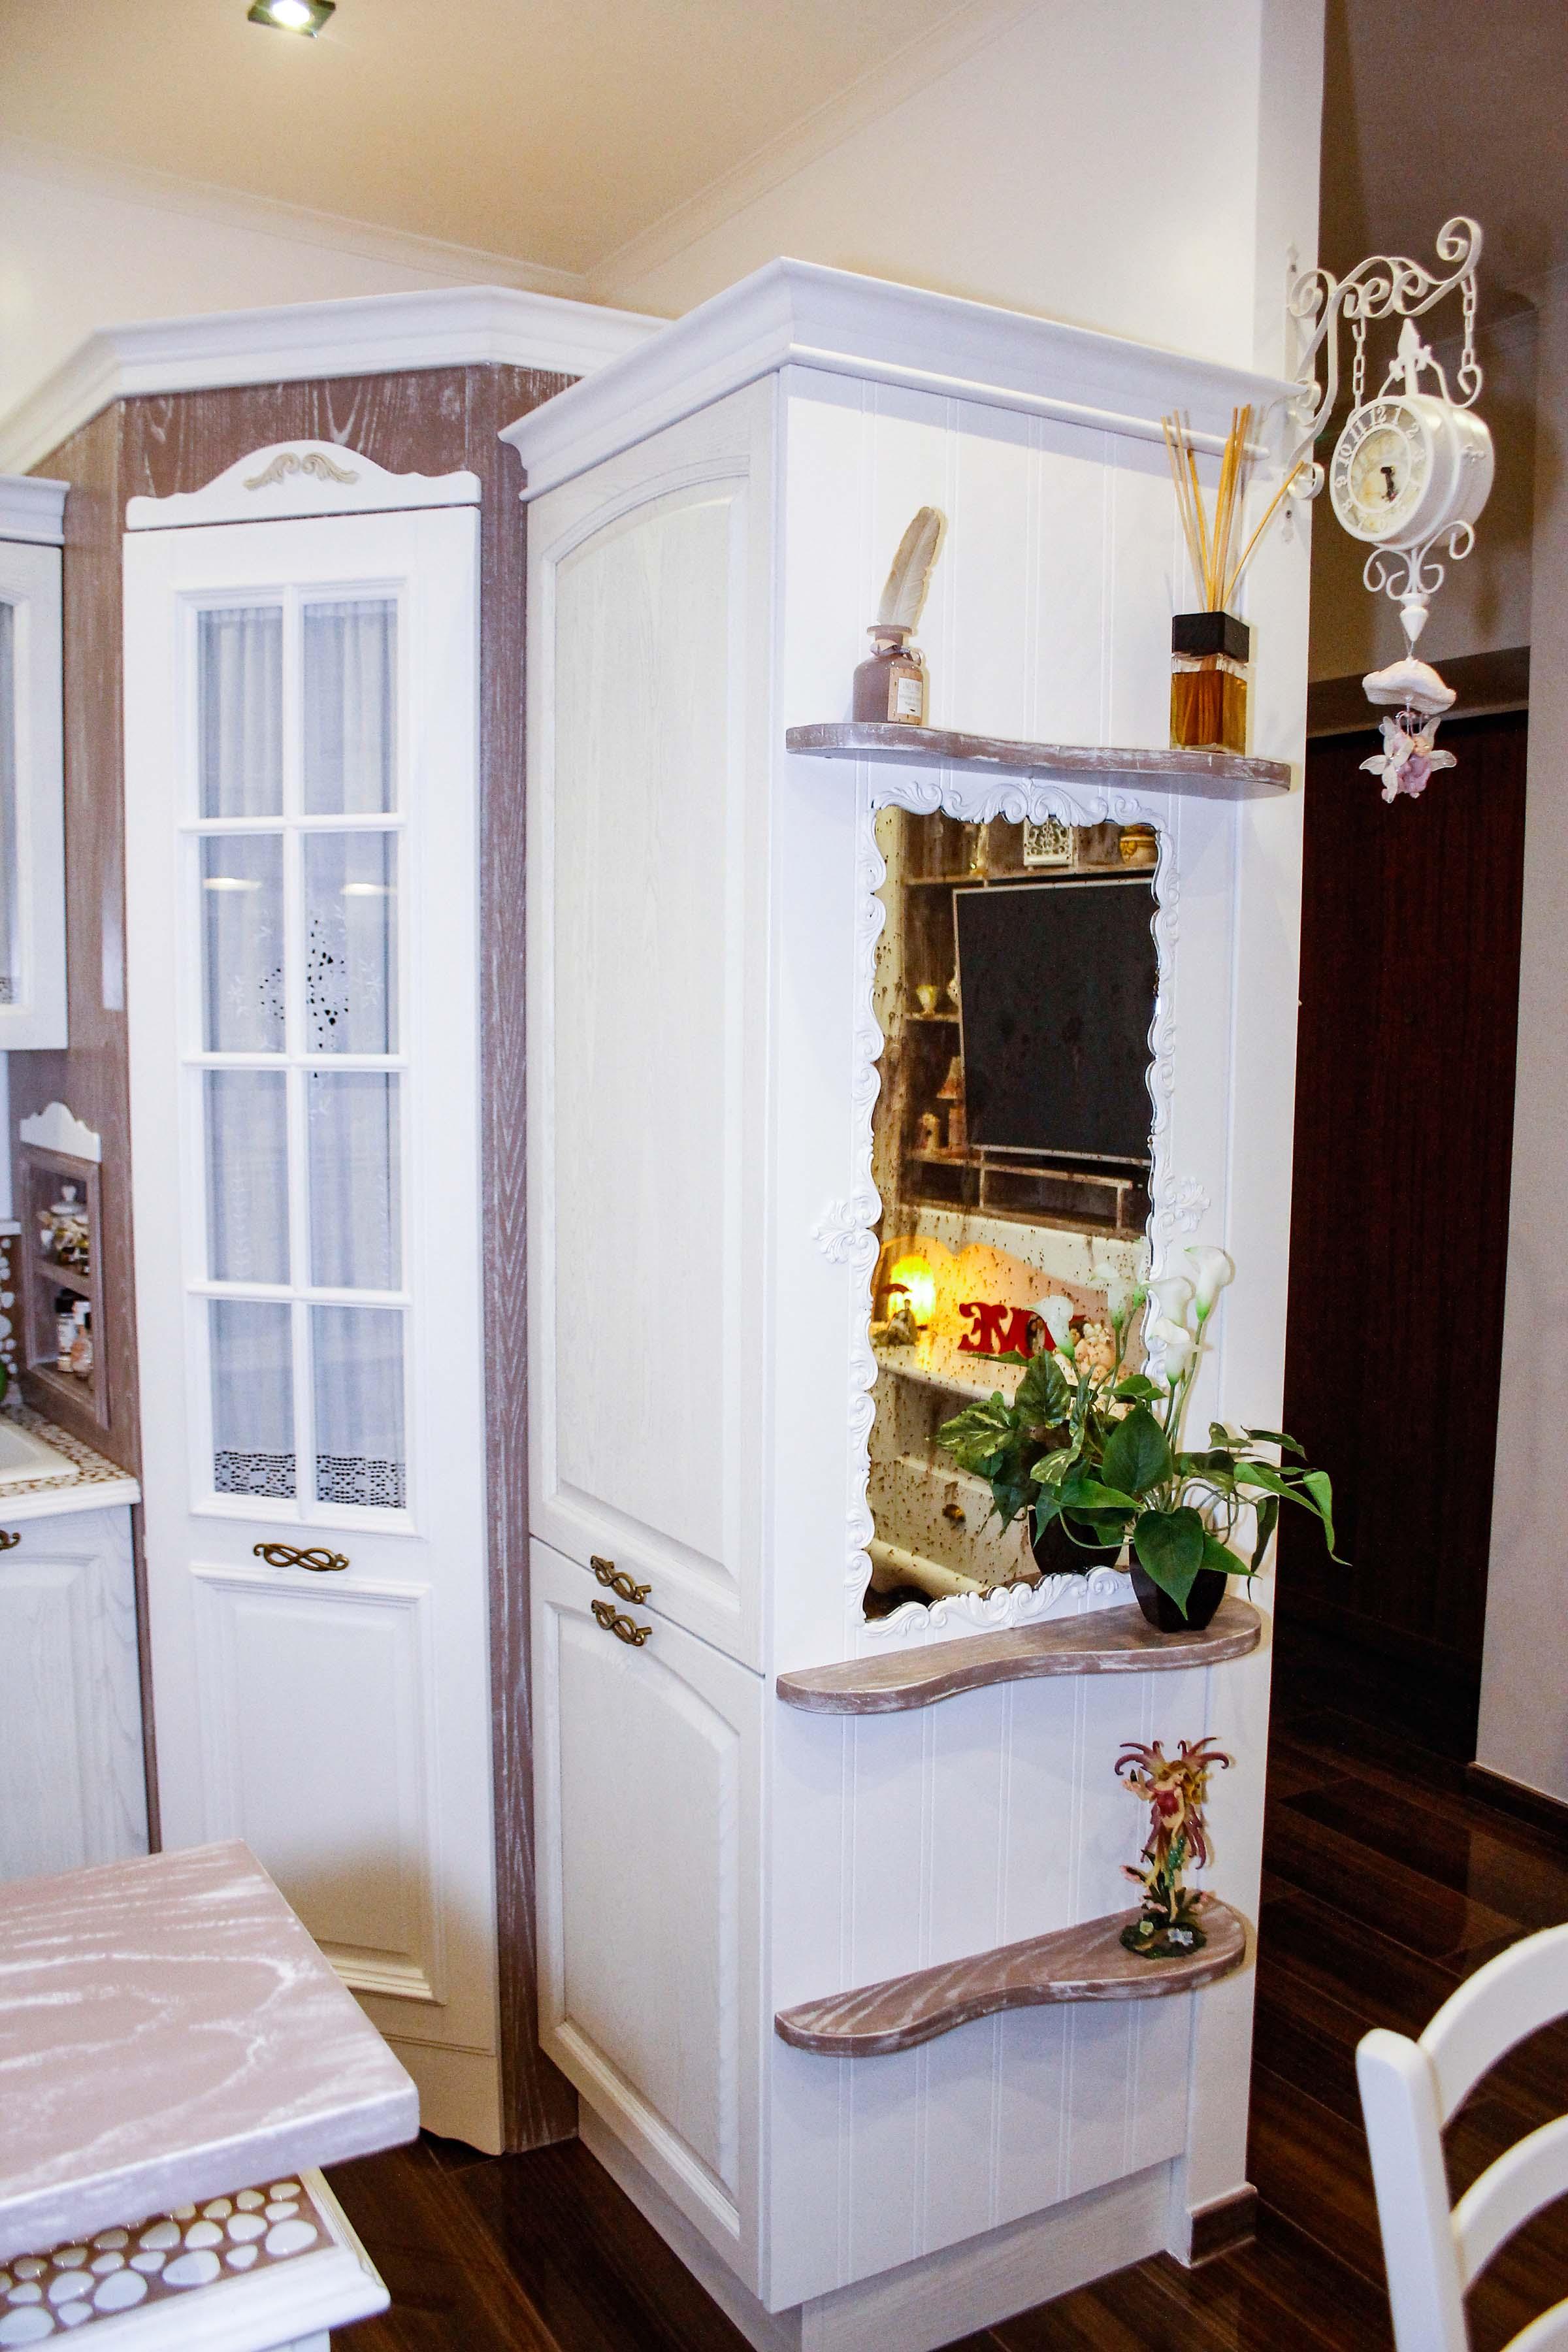 2-cucina shabby chic-su misura-falegname